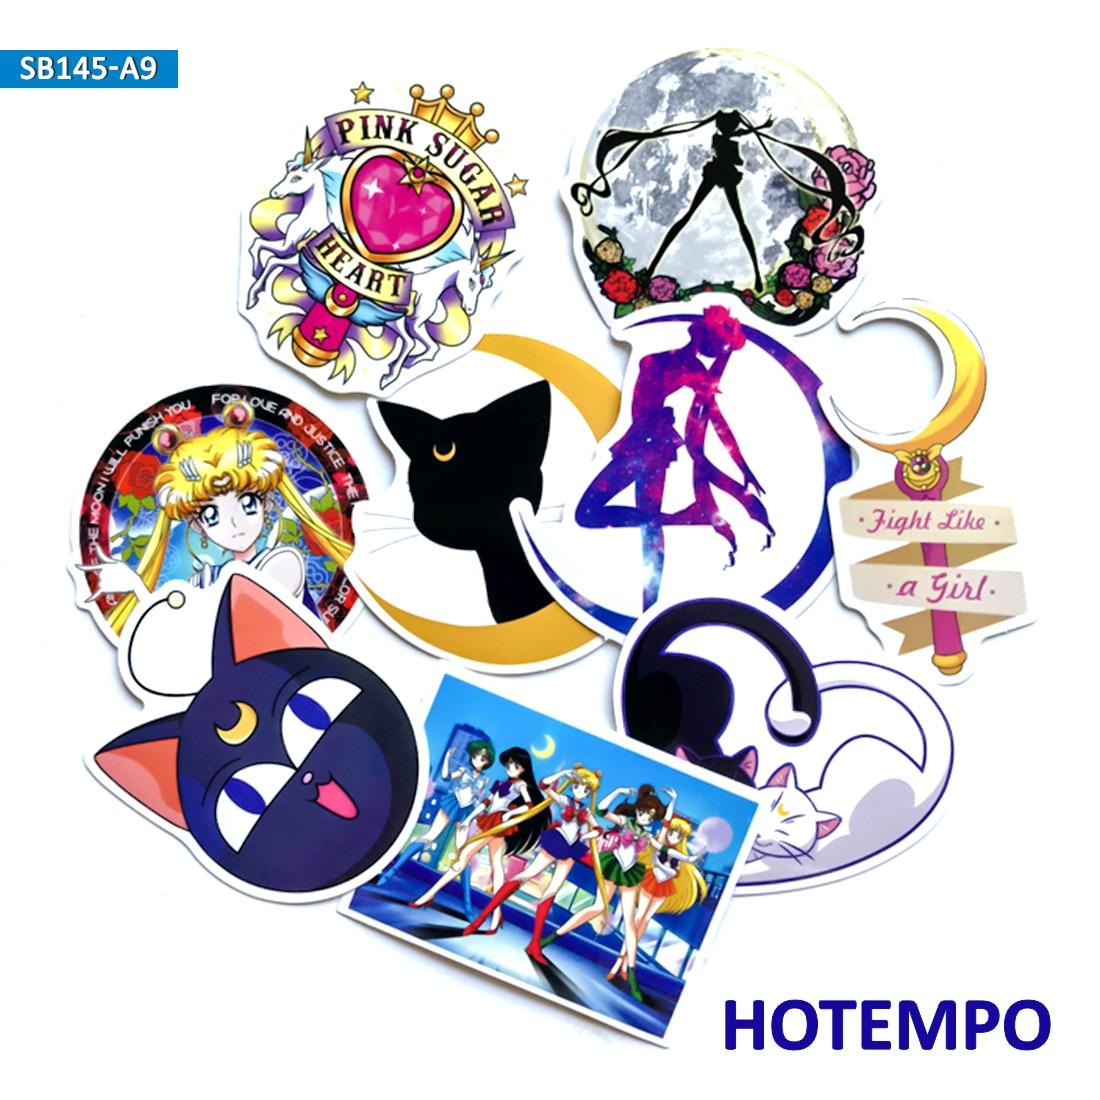 9 Uds. Pegatinas clásicas de Anime Sailor Moon para chica, teléfono móvil para niños, portátil, equipaje, caja de guitarra, pegatinas para monopatín y bicicleta